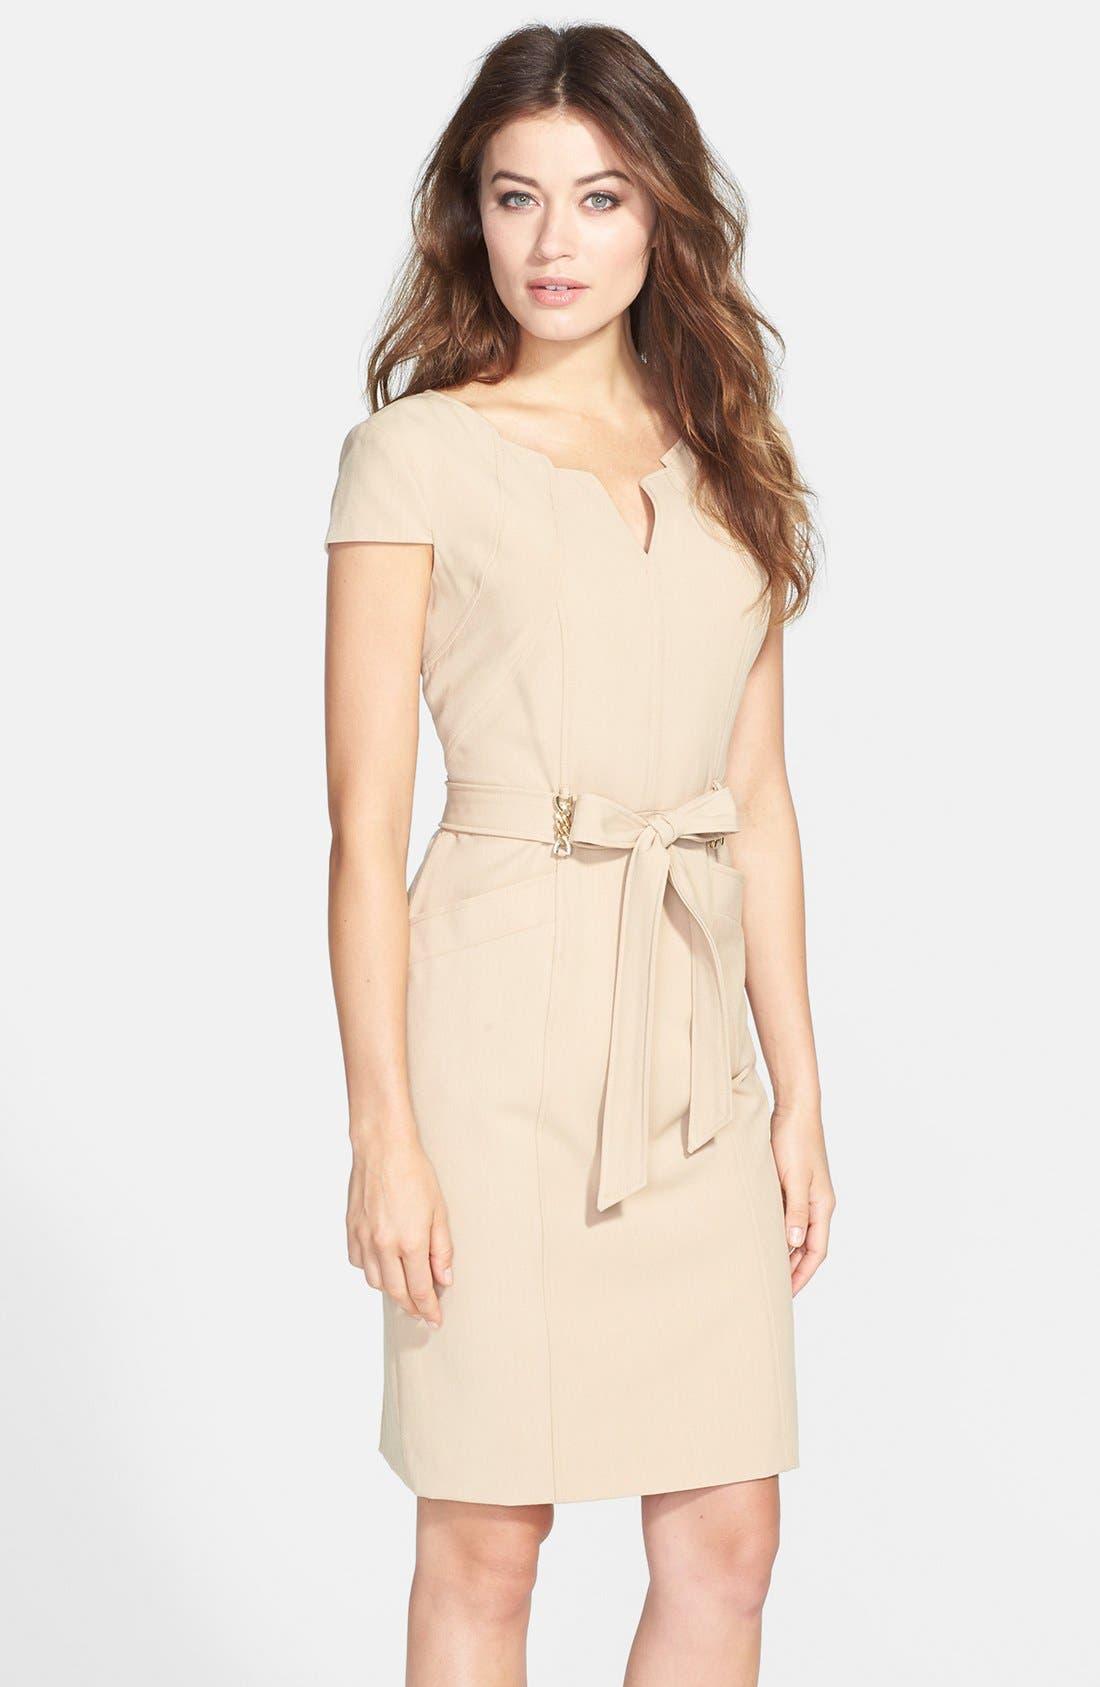 Alternate Image 1 Selected - Ellen Tracy Belted Stretch Sheath Dress (Regular & Petite)